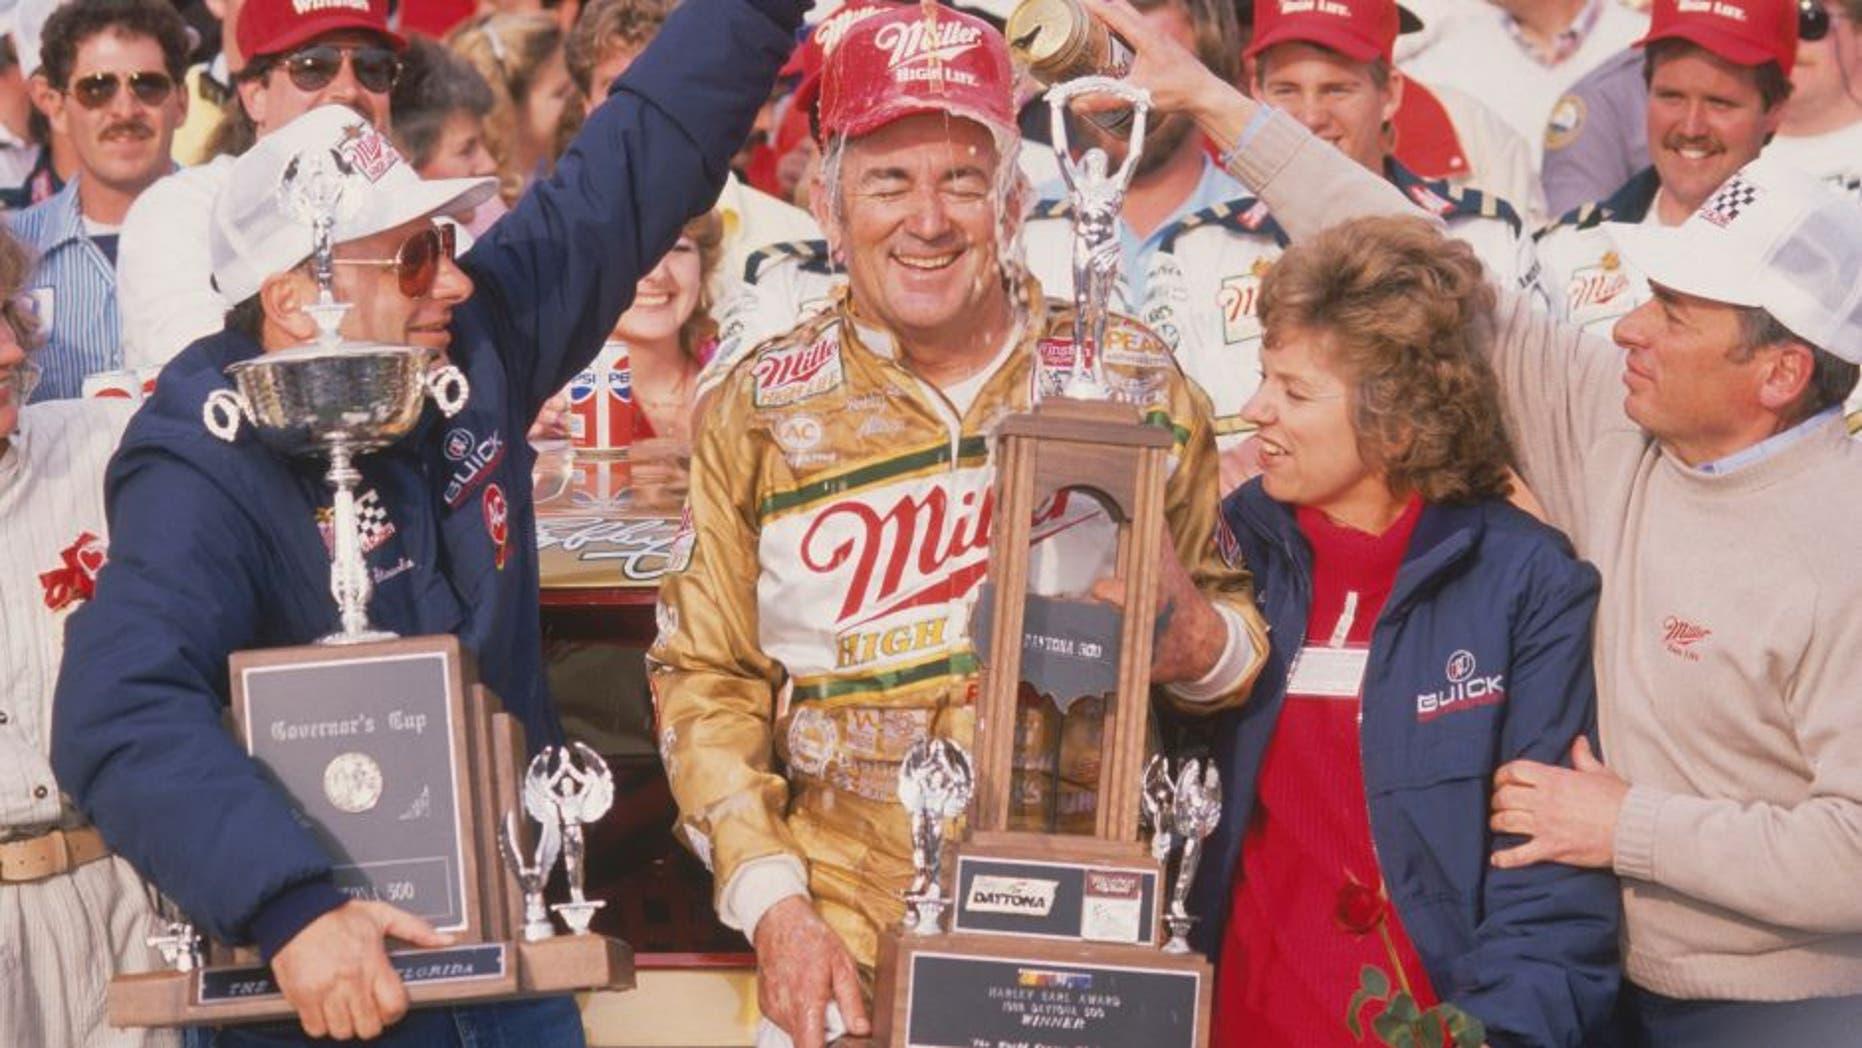 Countdown to Daytona: Bobby Allison's final career win in